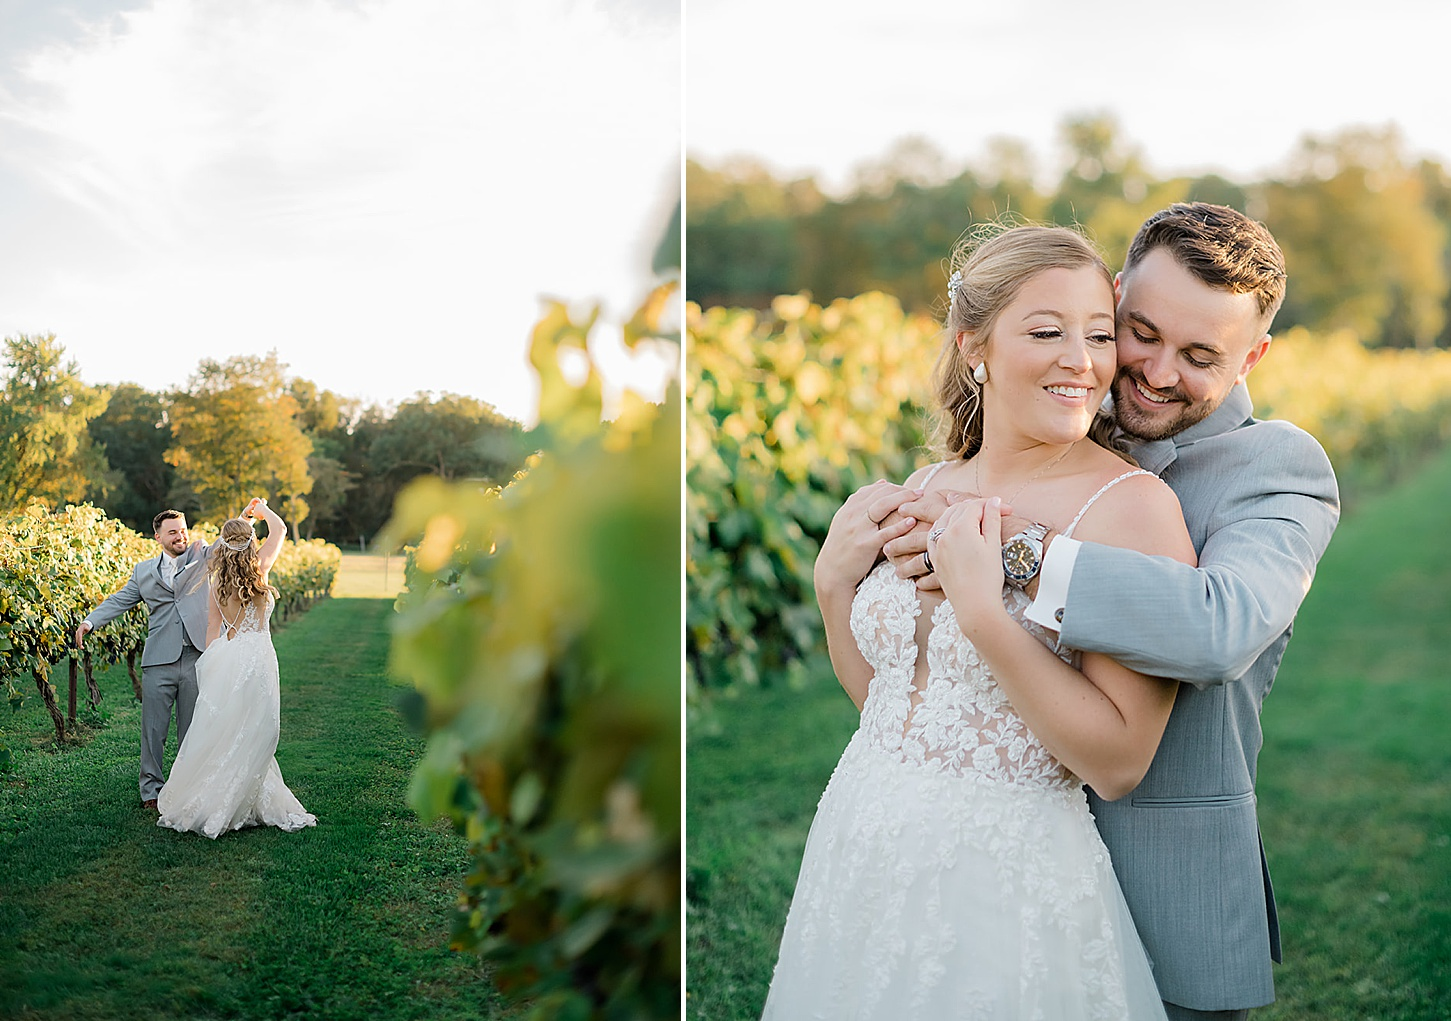 Valenzano Winery Vitners Pavillion Wedding Photography by Magdalena Studios 0033